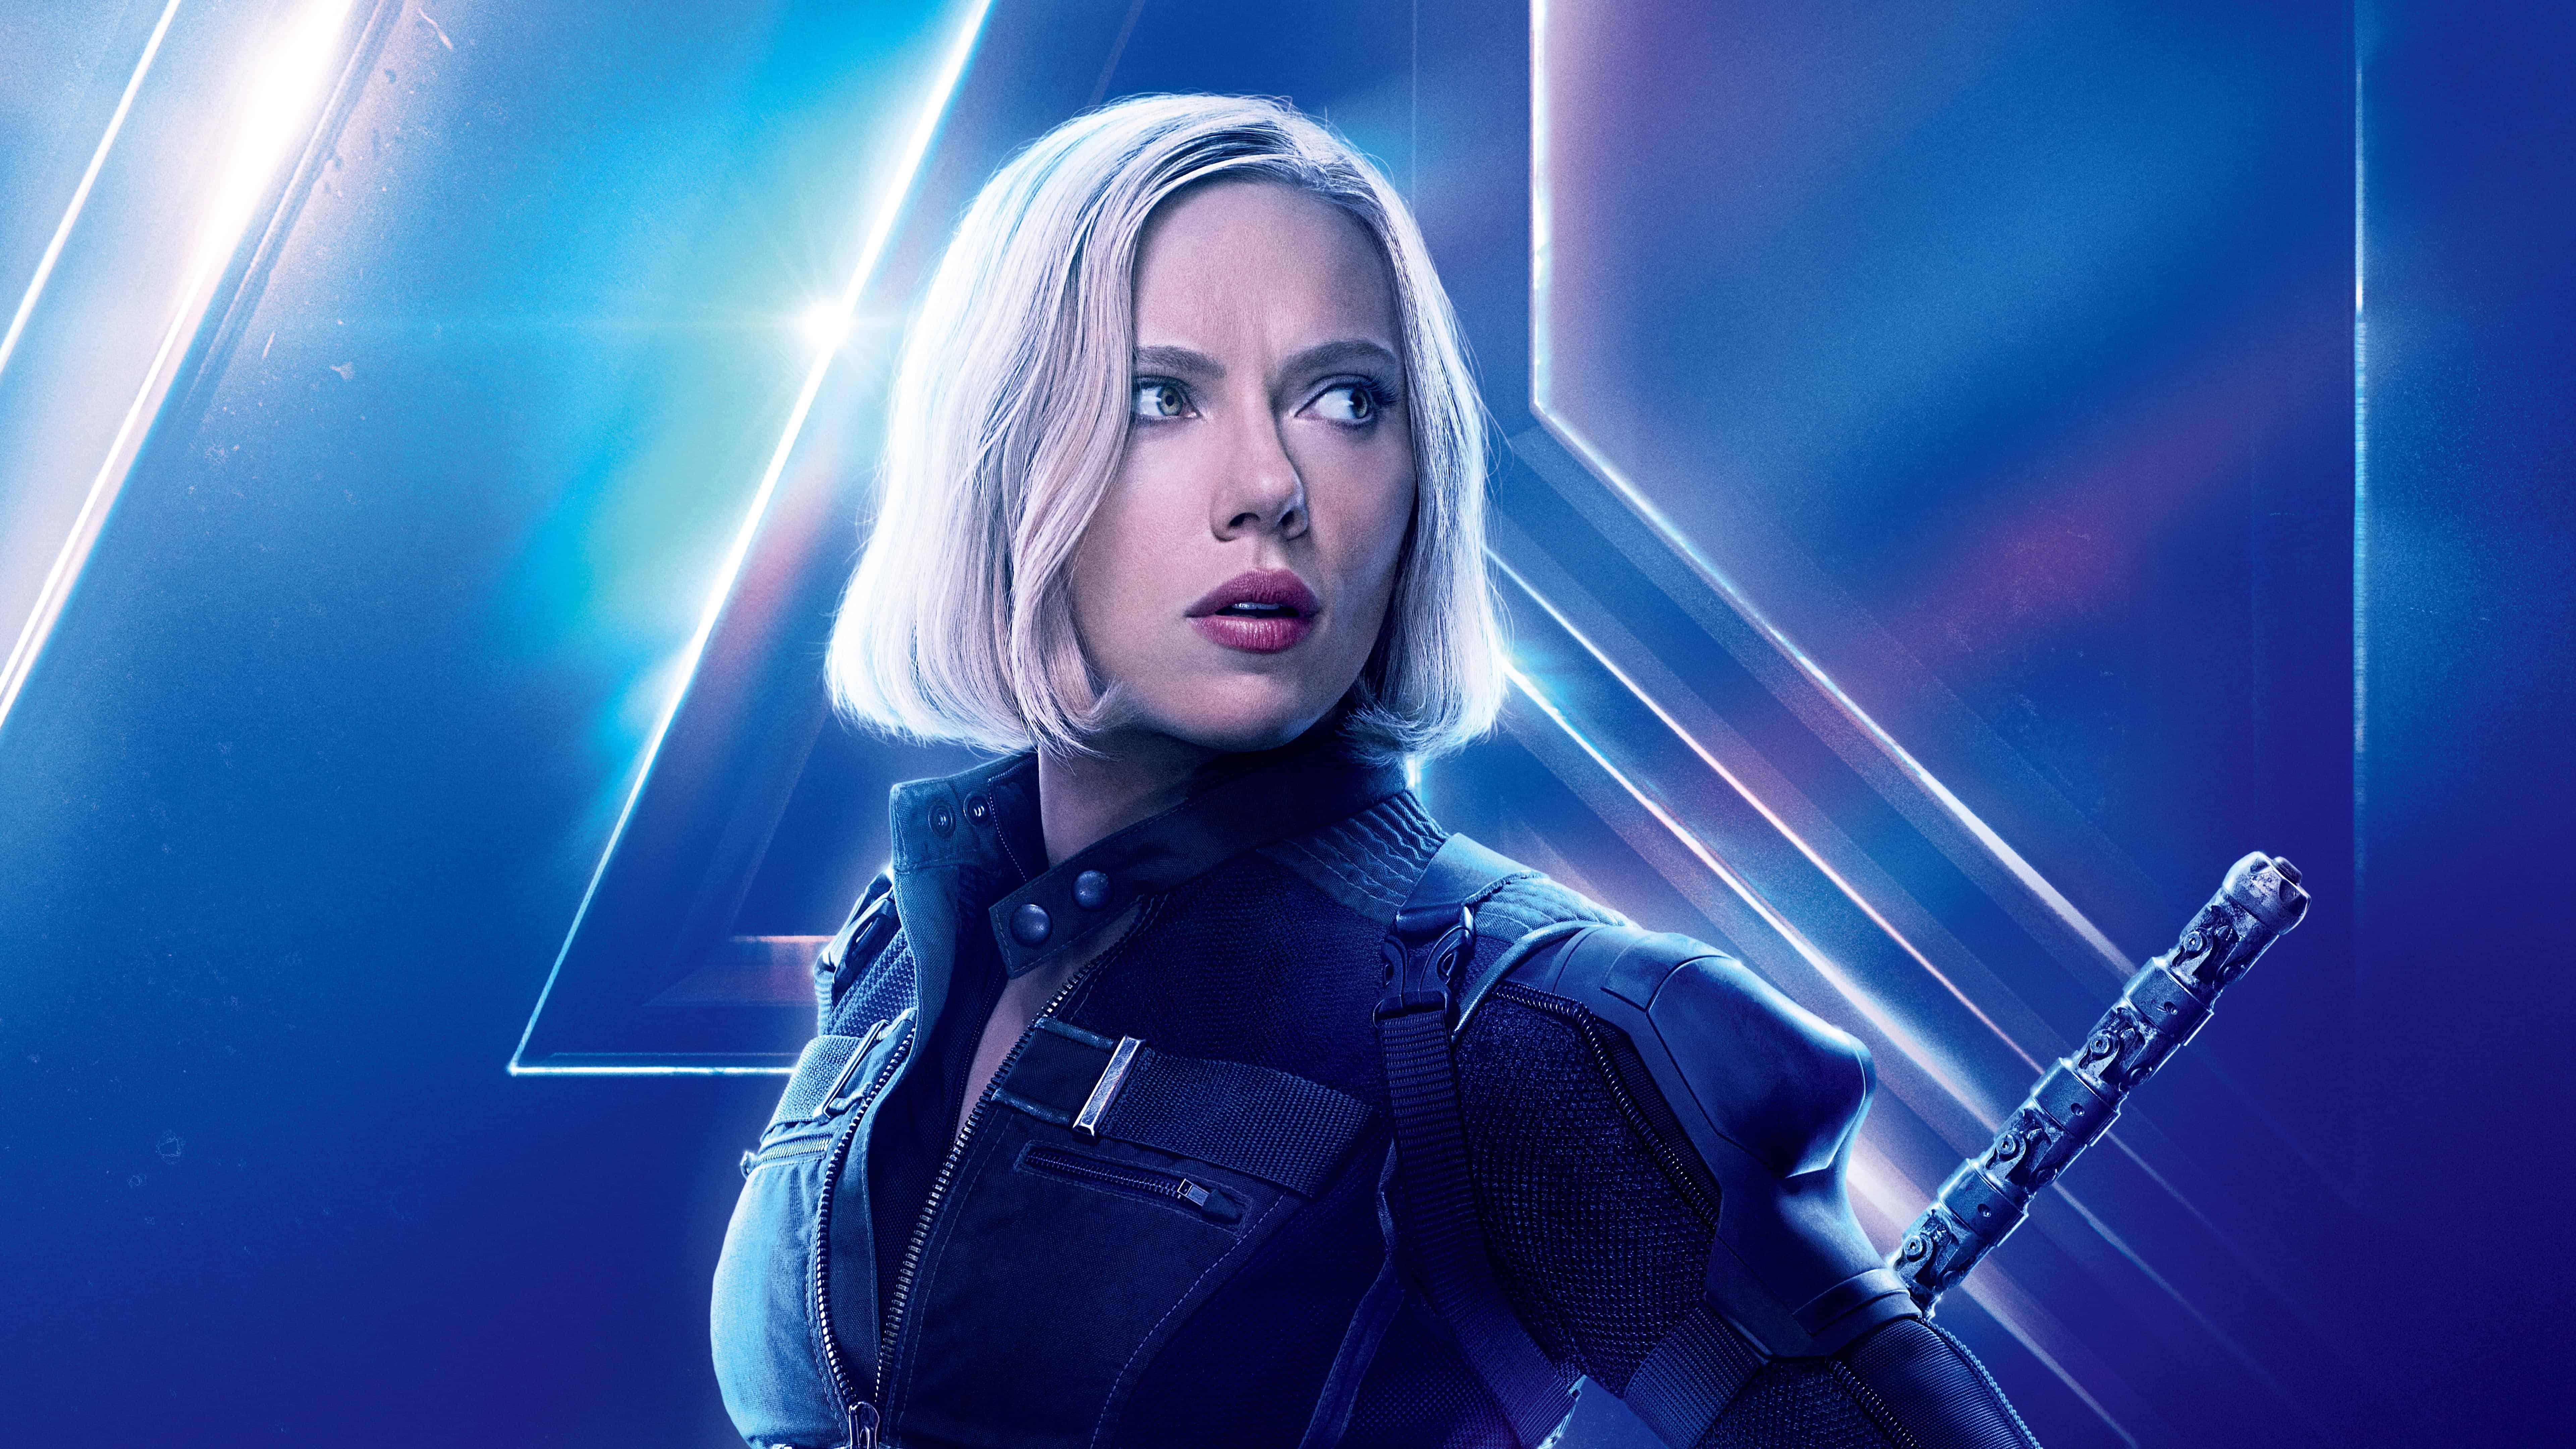 18] Black Widow Infinity War Wallpapers on WallpaperSafari 7680x4320